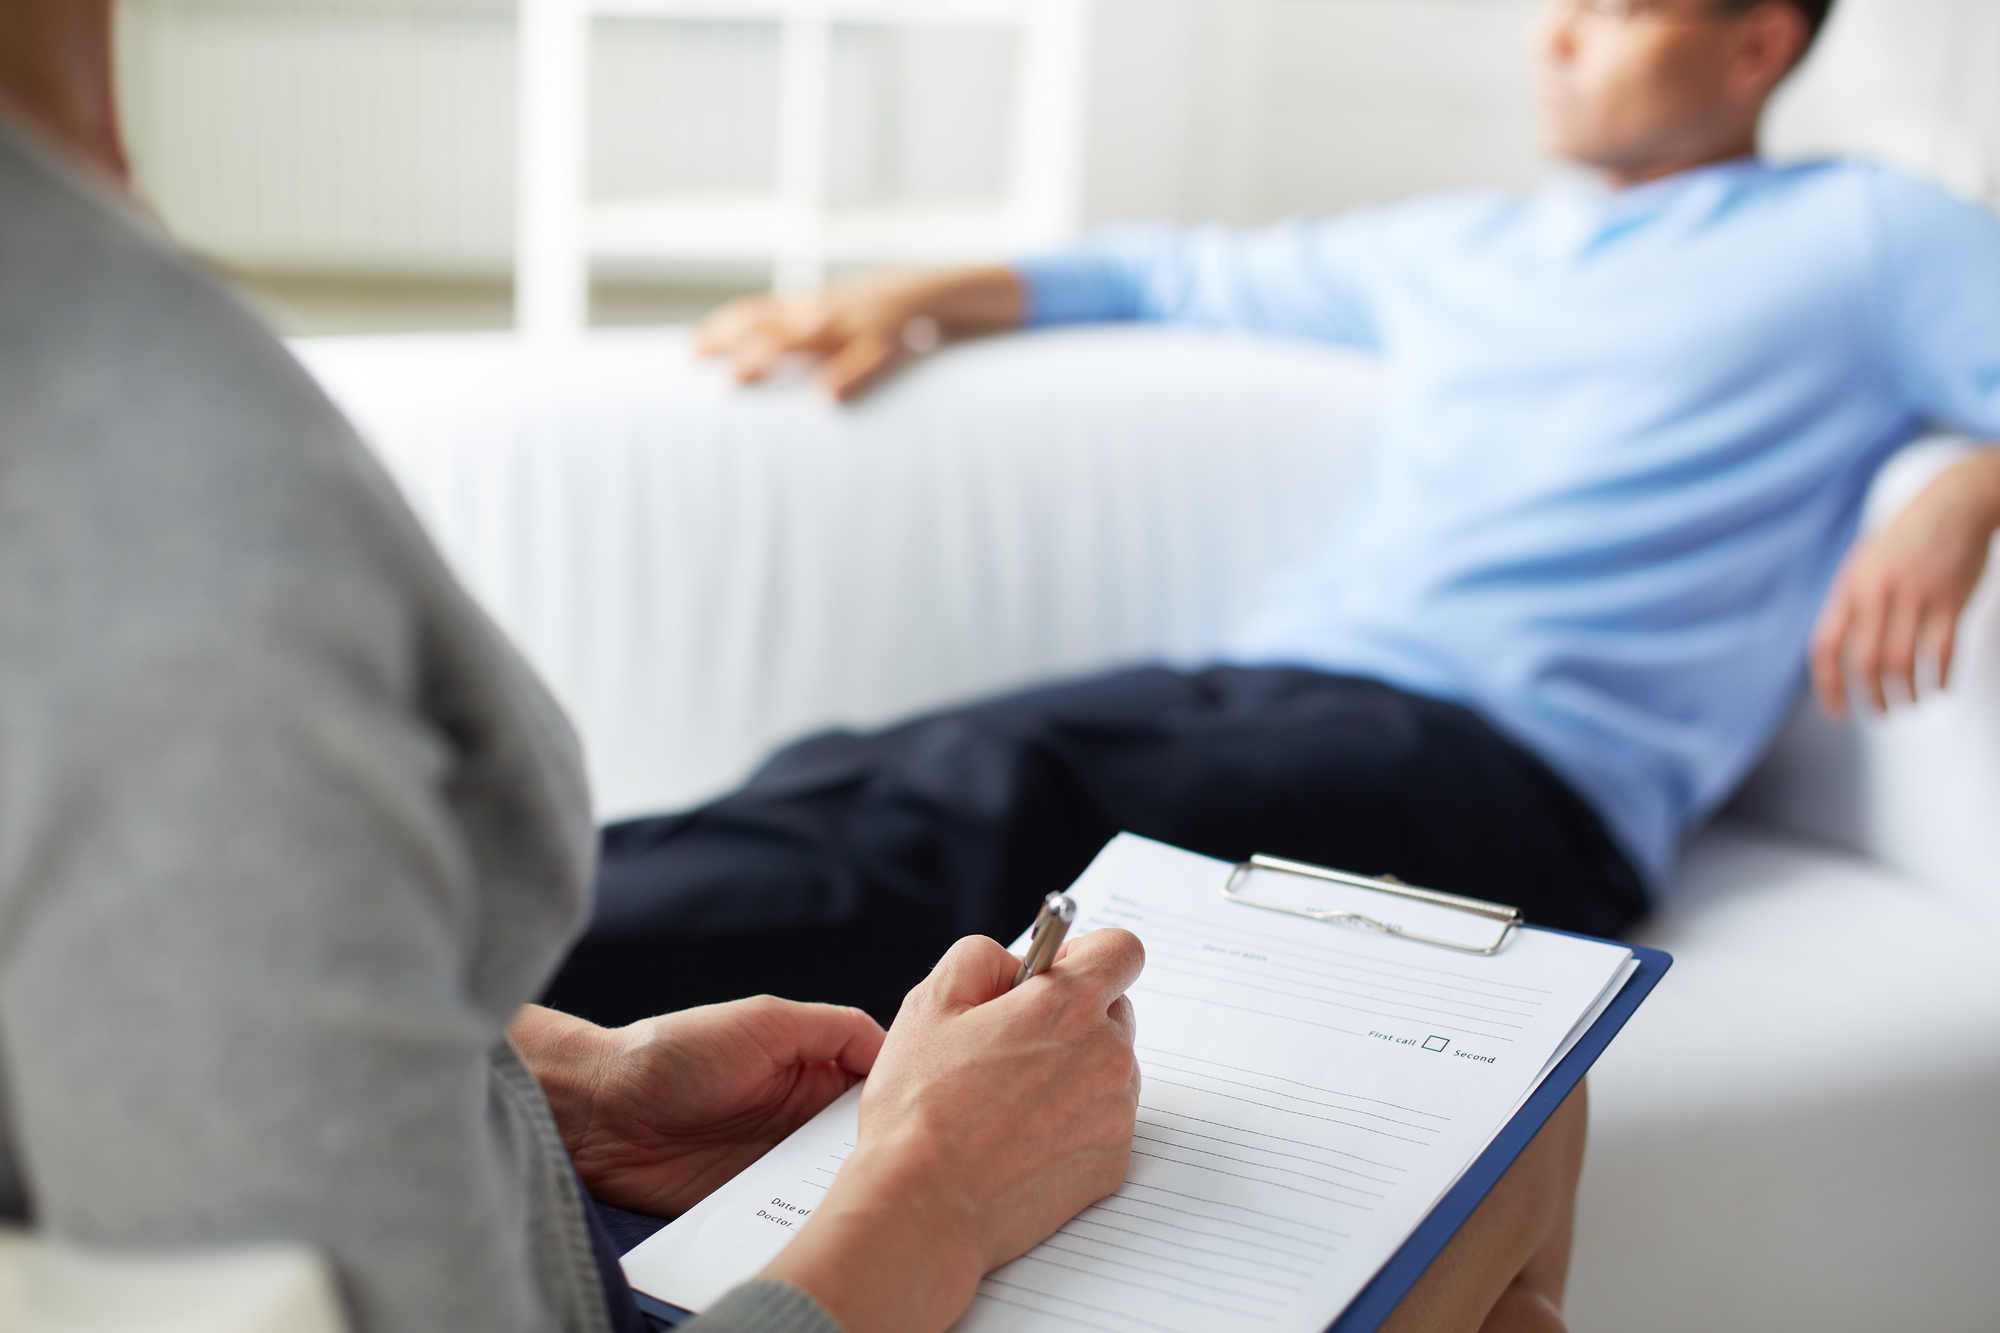 Perlukah Melakukan Konsultasi Psikologi ke Psikolog